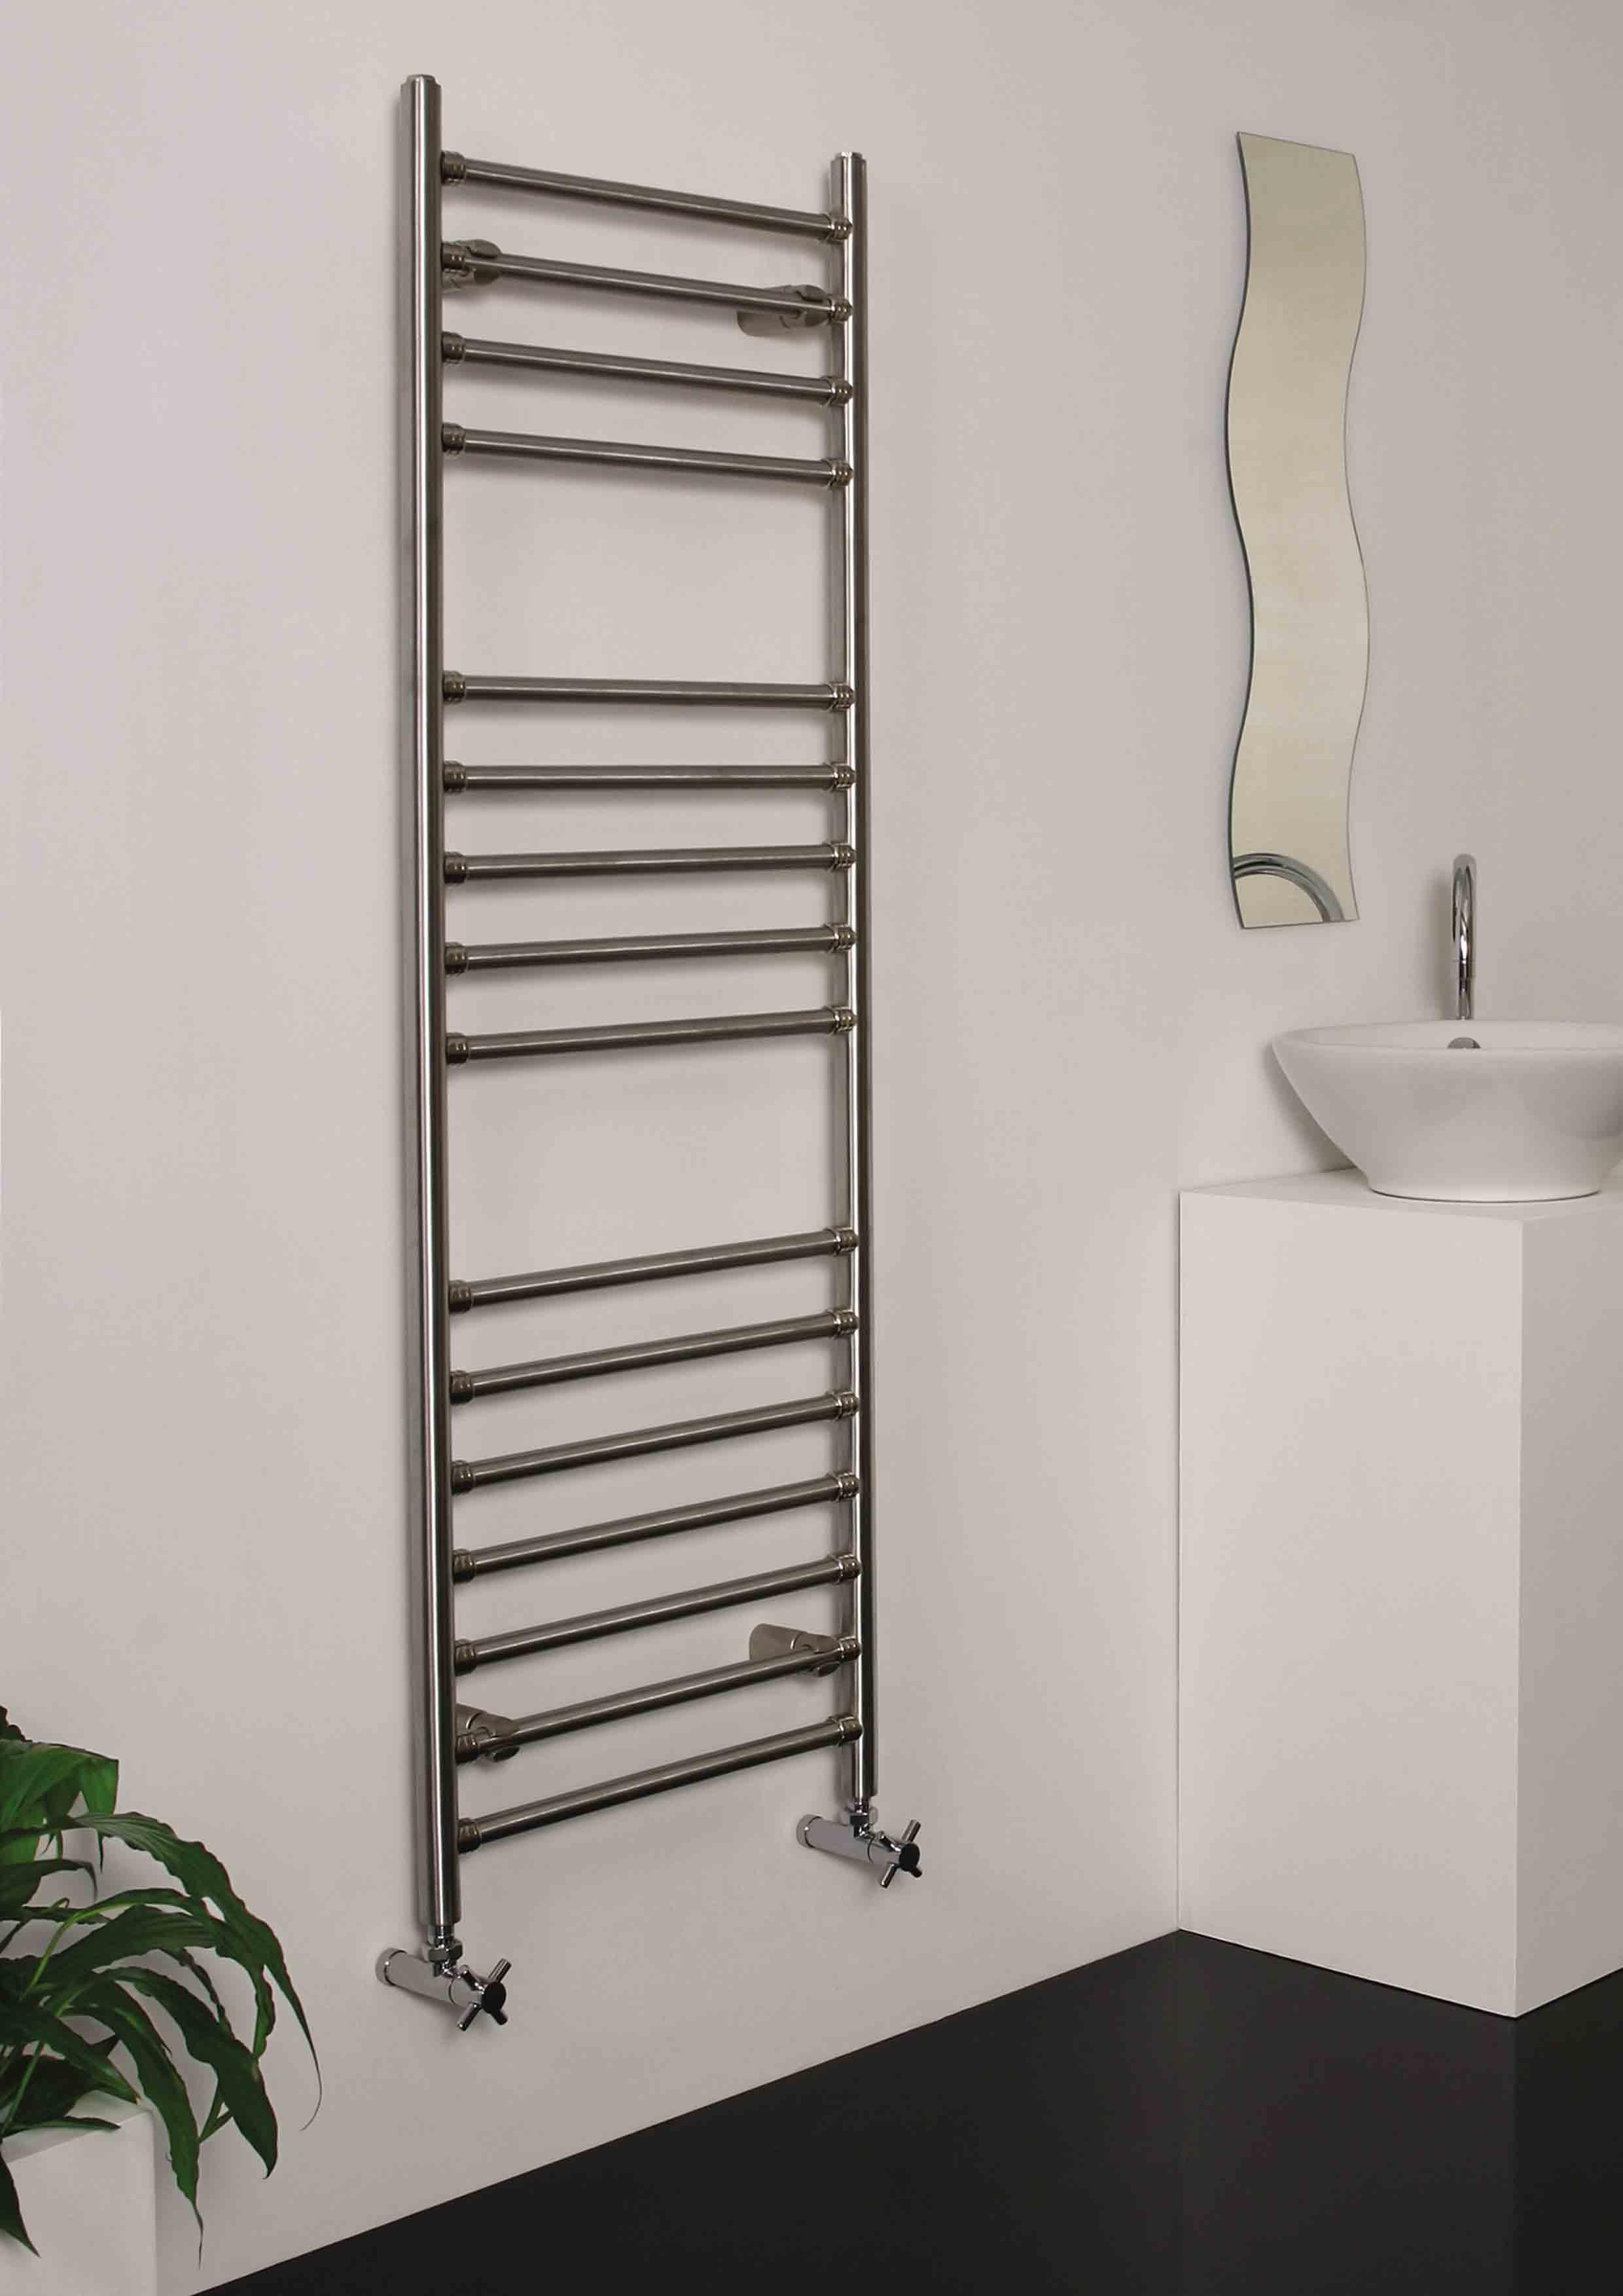 radiateur seche serviette inox uc71 jornalagora. Black Bedroom Furniture Sets. Home Design Ideas